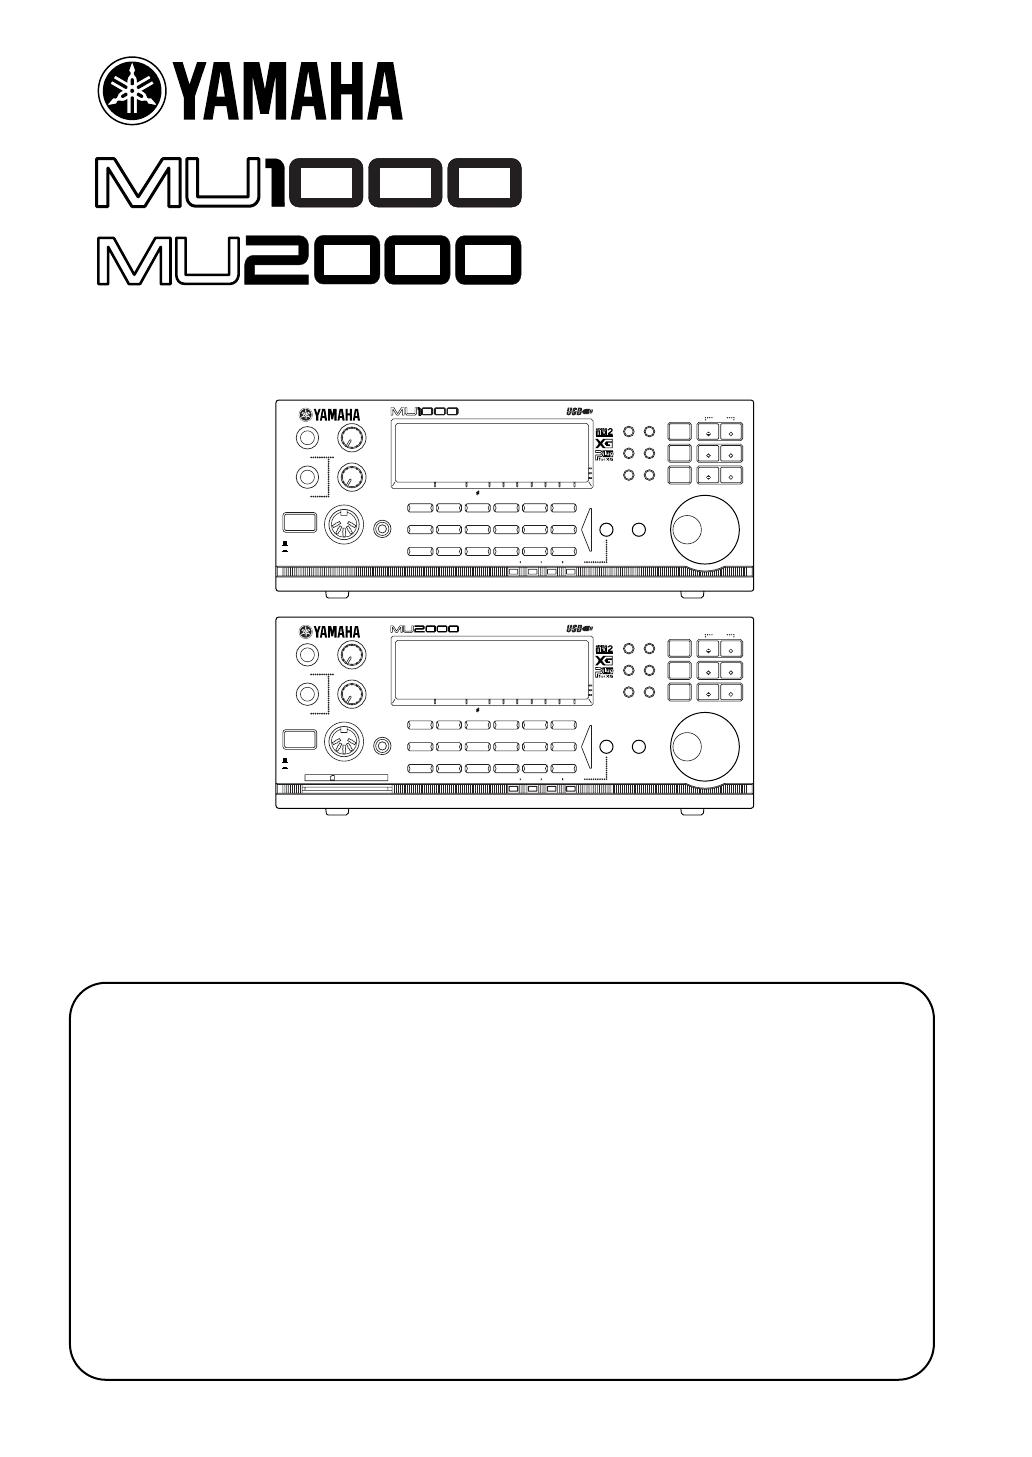 Yamaha Mu2000 Owners Manual